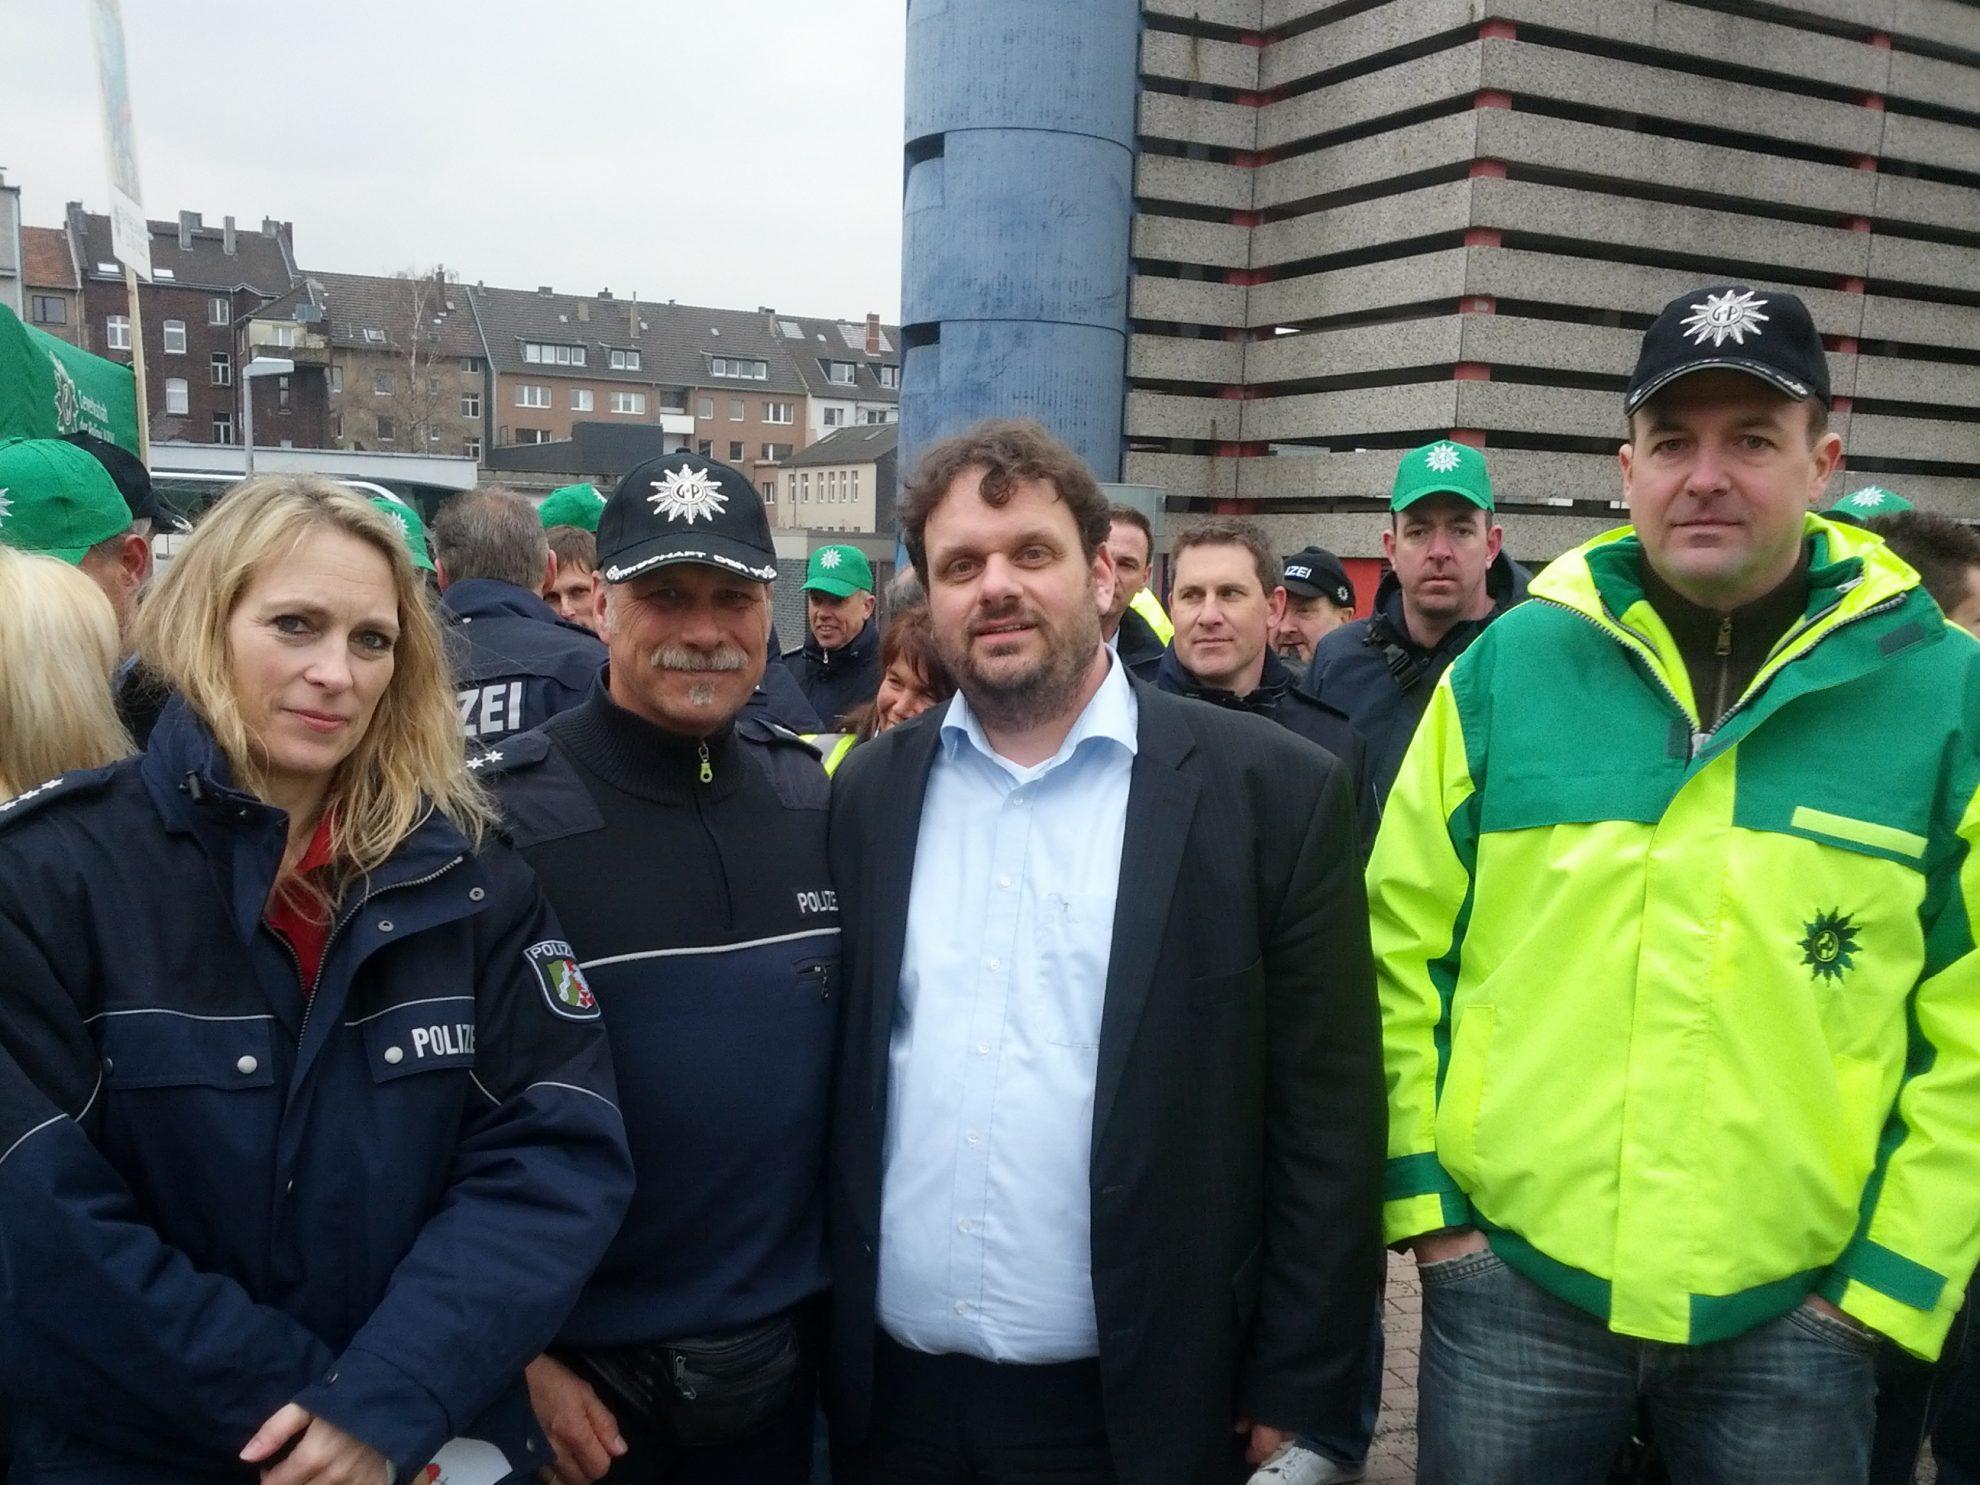 Dagmar Andres und Guido van den Berg bei der GdP vor dem Landtag (21.03.2013)